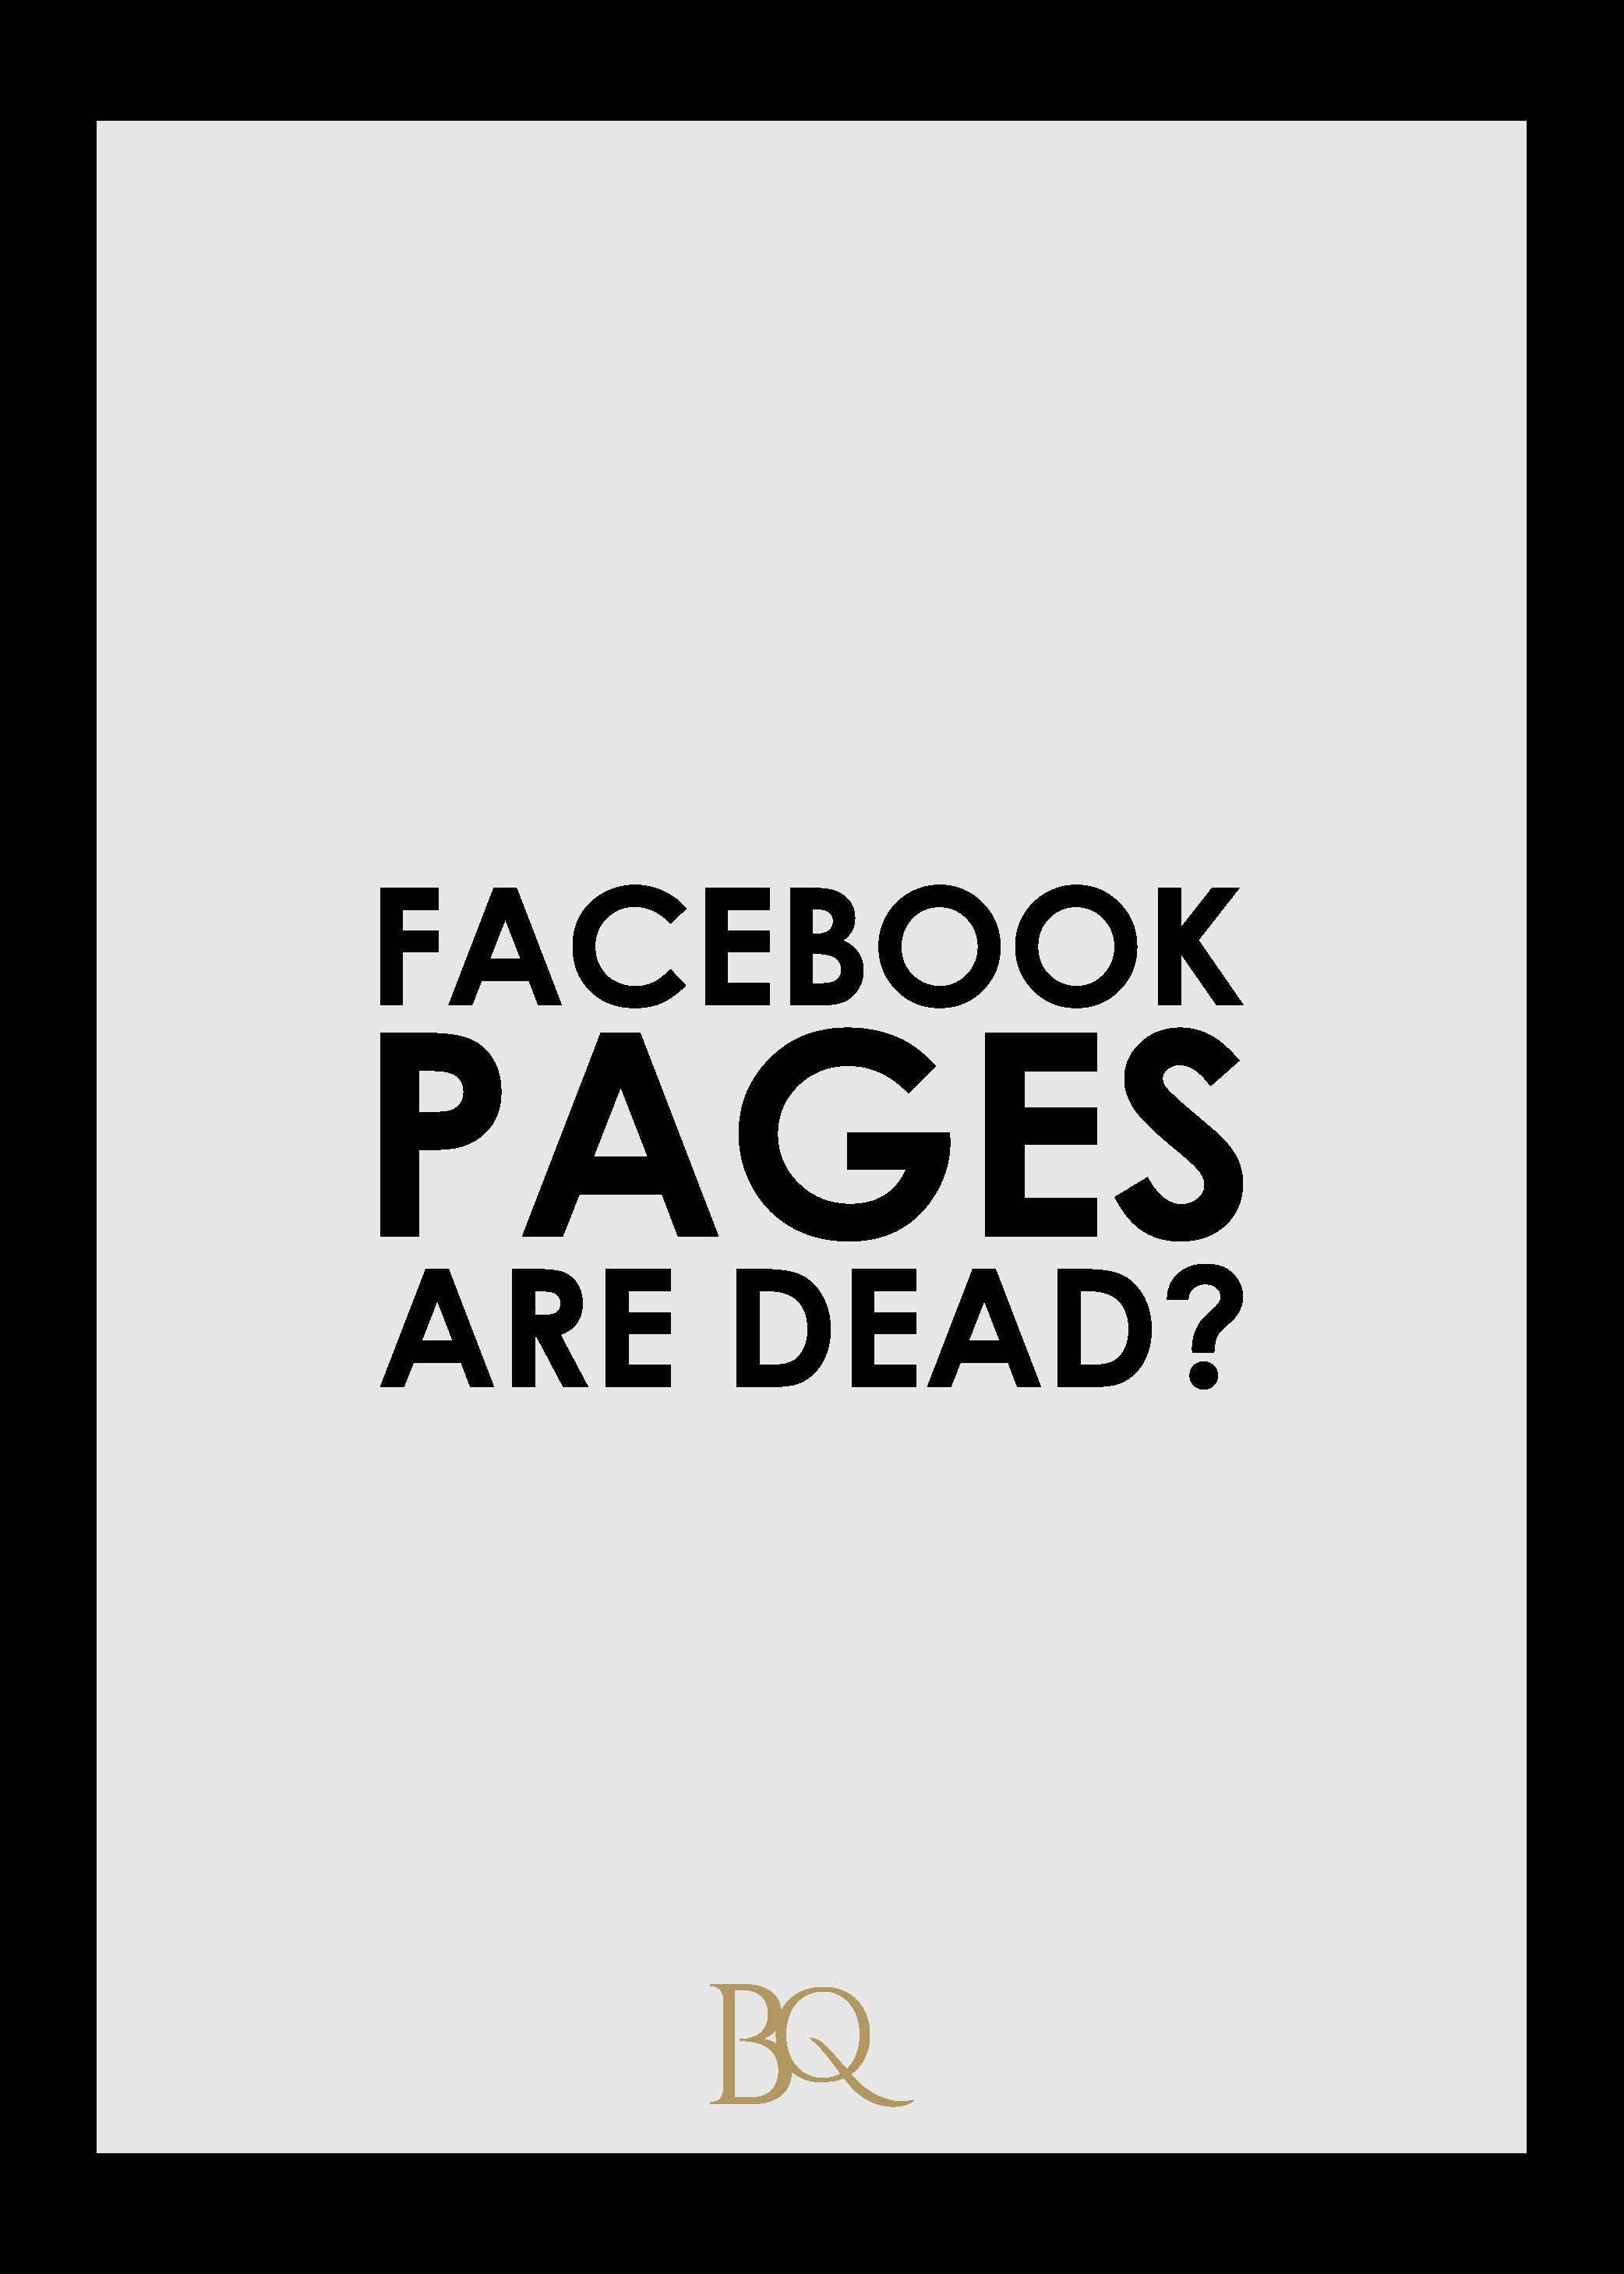 Facebook Pages Are Dead The Branding Queen cdb design studio